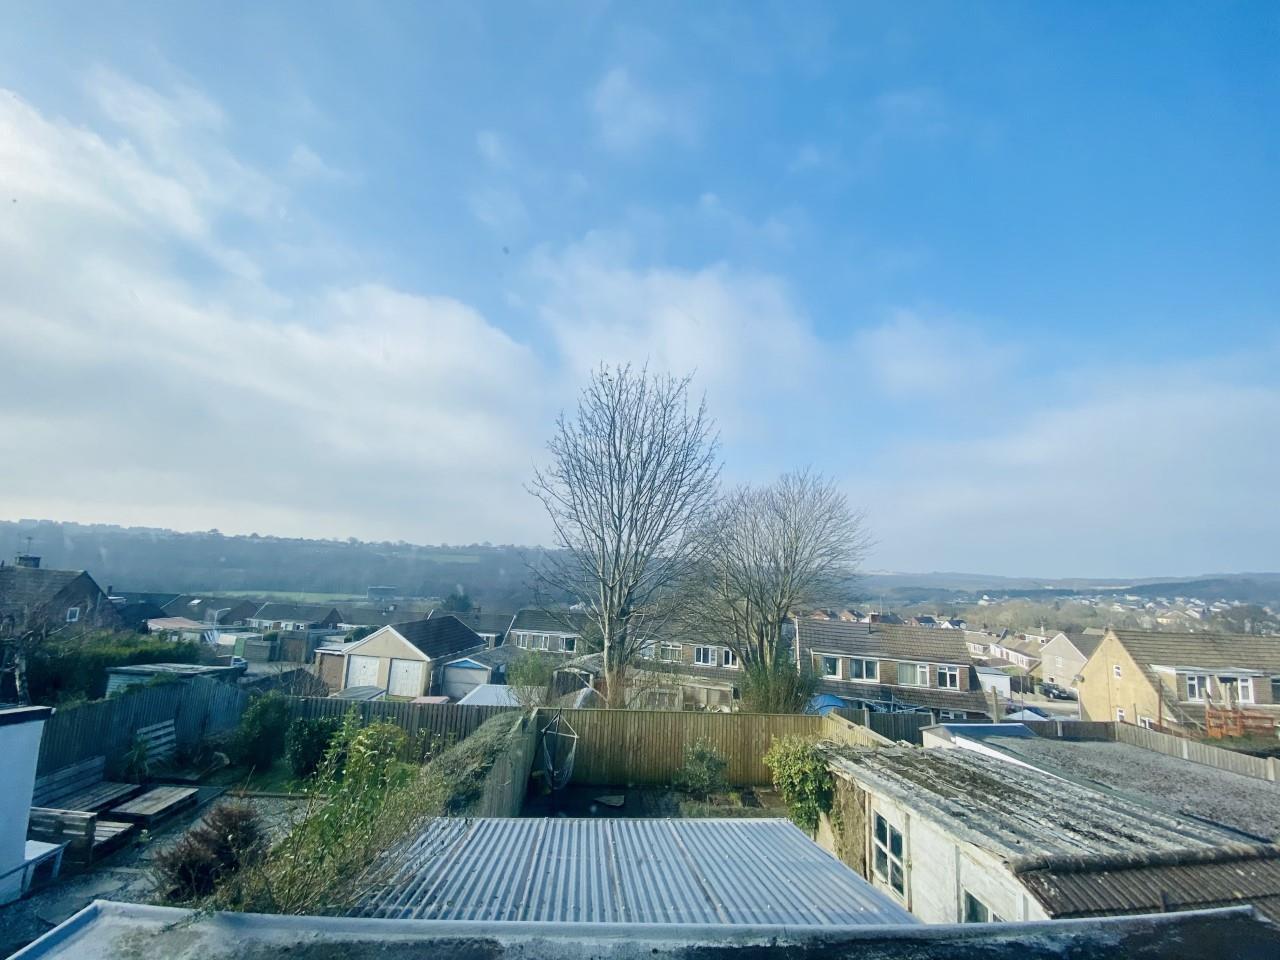 Y Gorlan, Dunvant, Swansea, SA2 7RH